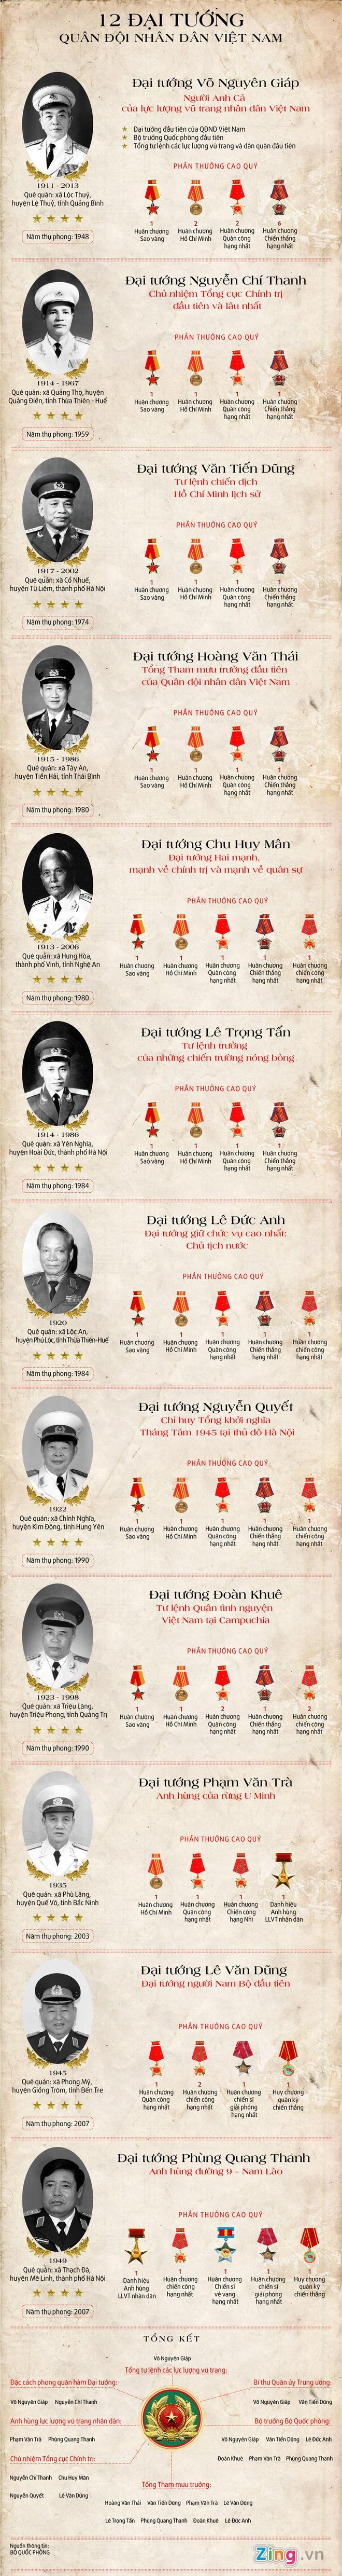 12 Dai tuong cua Quan doi Nhan dan Viet Nam hinh anh 1